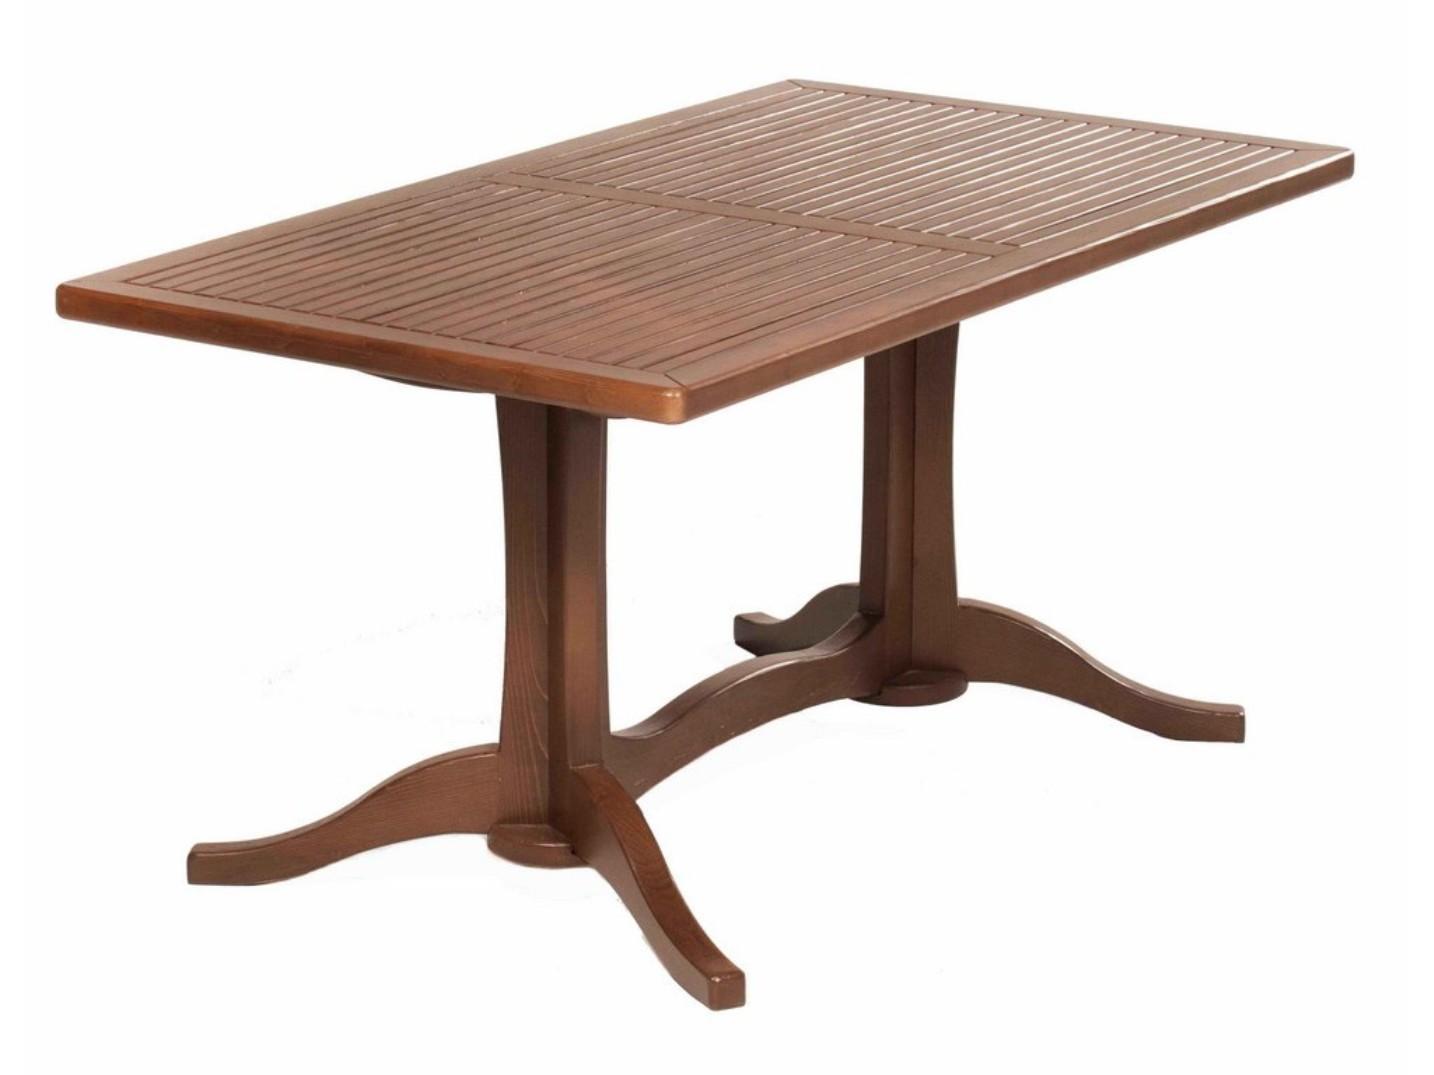 Стол ЖардинСтолы и столики для сада<br>Стол из натуральной древесины.<br><br>kit: None<br>gender: None